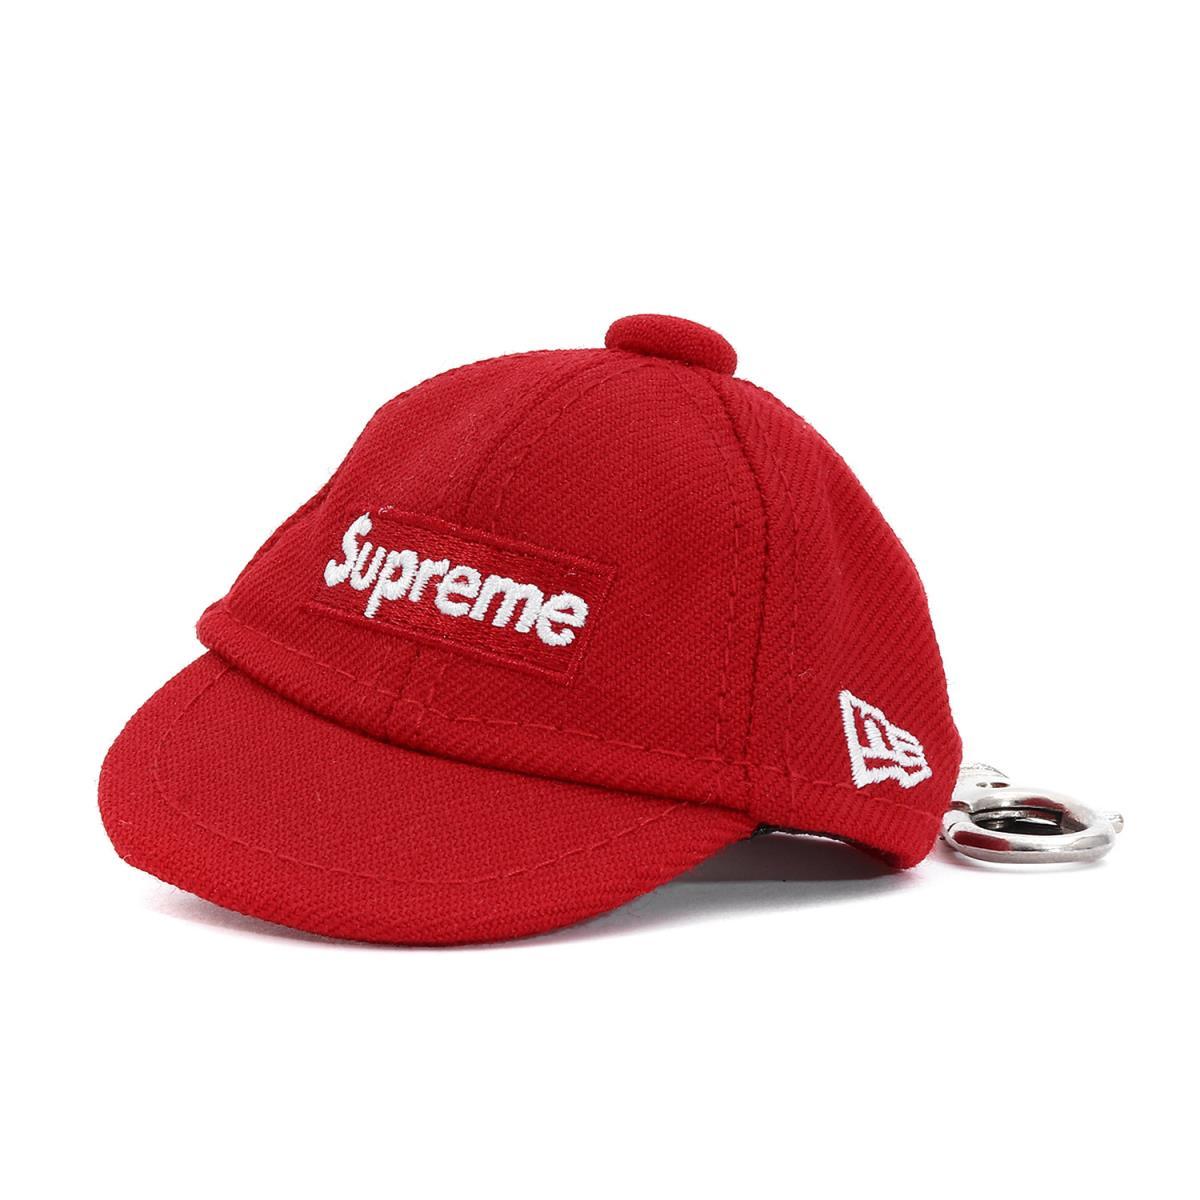 Supreme (シュプリーム) 14A/W ×NEW ERA BOXロゴベースボールキャップキーチェーン(Keychain) レッド 【美品】【メンズ】【K2091】【中古】【あす楽☆対応可】